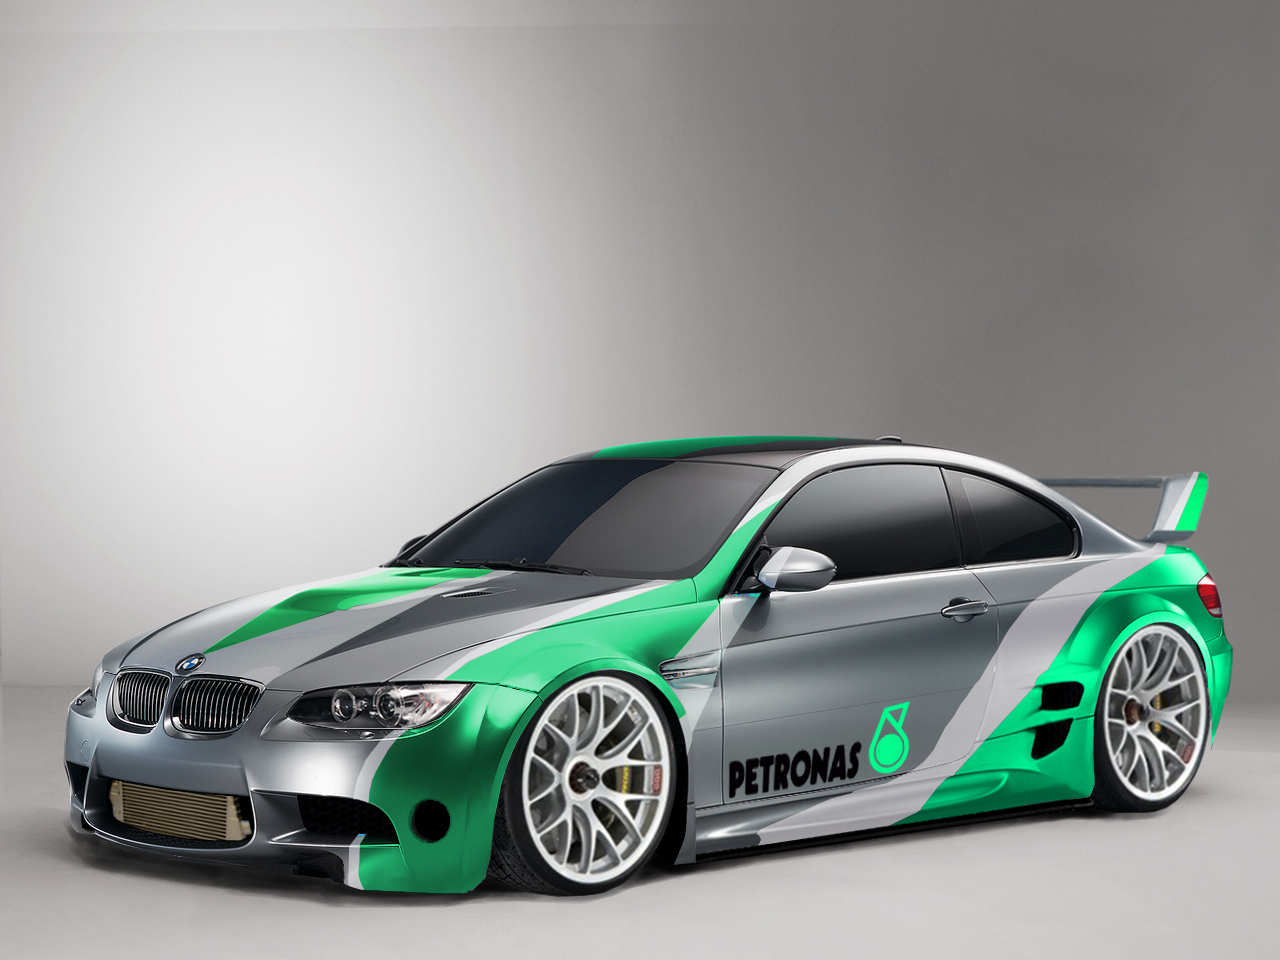 http://3.bp.blogspot.com/-TPqqMCWz10o/Tagy_V1ibCI/AAAAAAAAAEg/gfsJKCPvN2A/s1600/BMW_m3_Petronas_by_KurtDjango.jpg